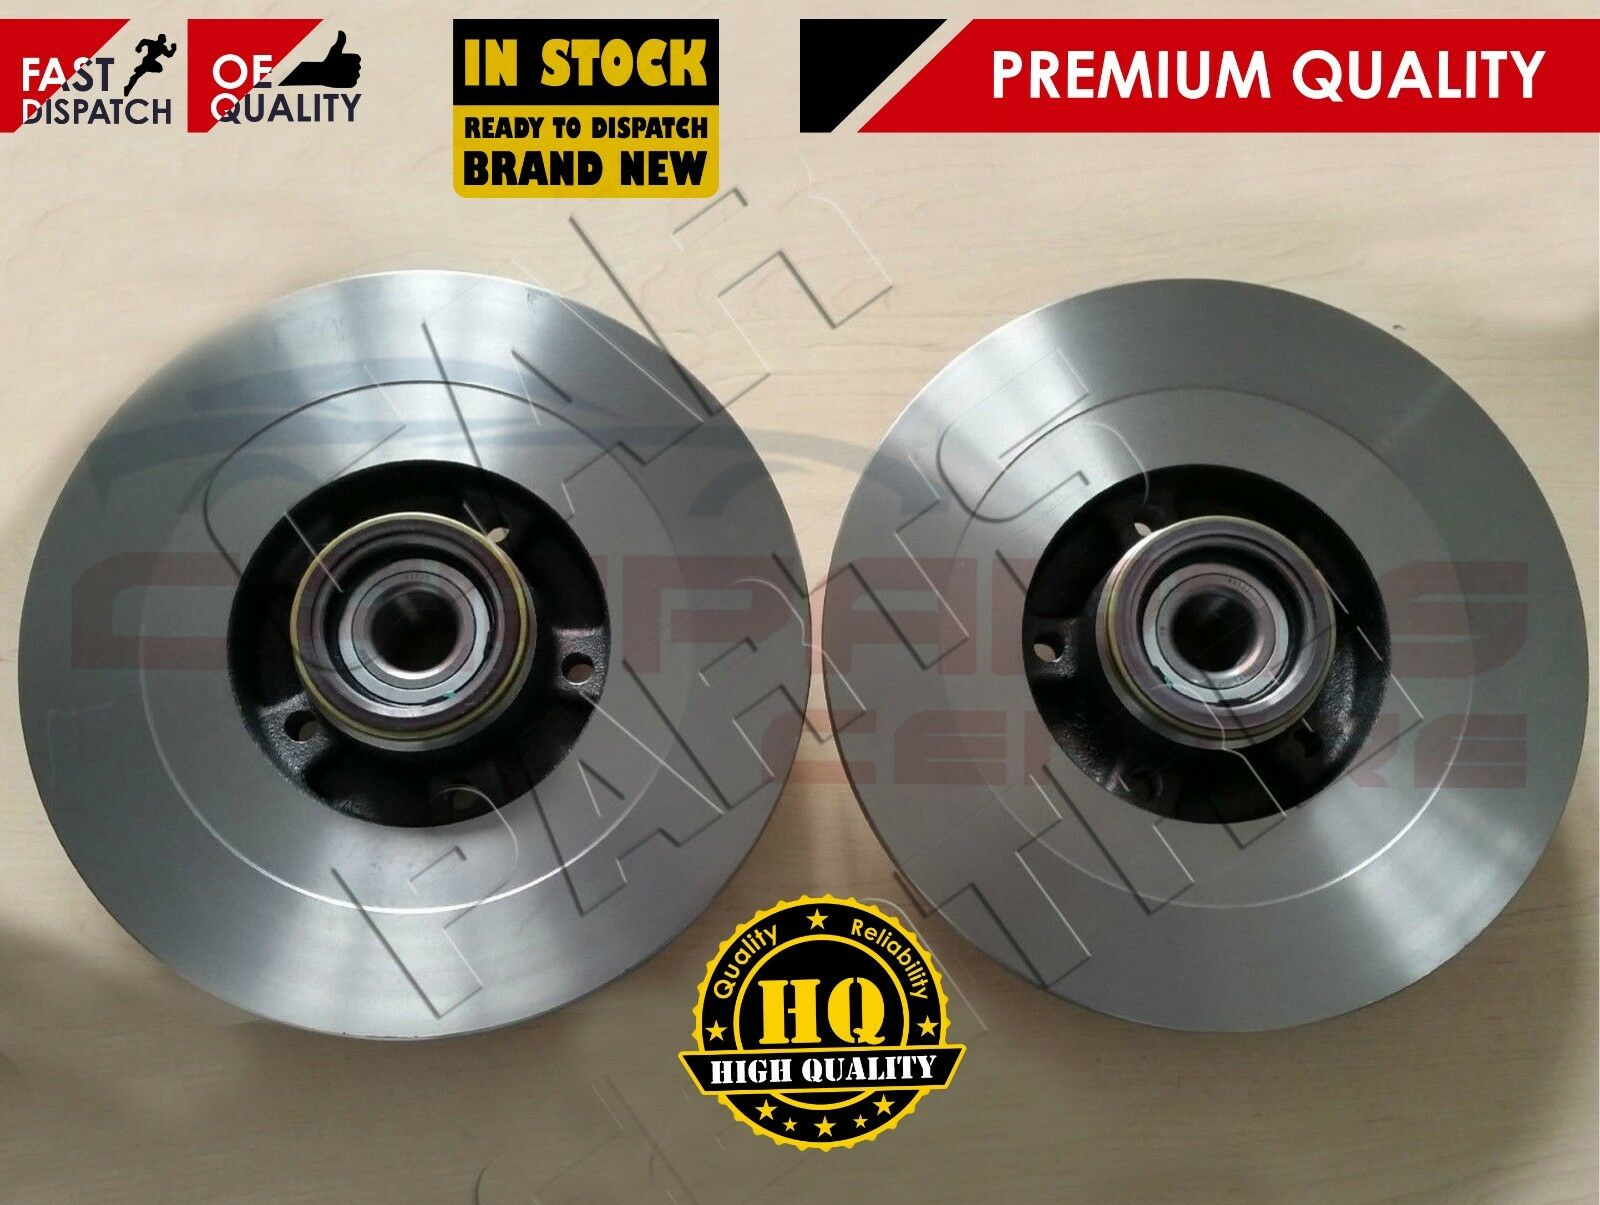 FOR RENAULT CLIO 197 SPORT 2.0 16V 2006-2009 PREMIUM REAR BRAKE DISCS 300mm